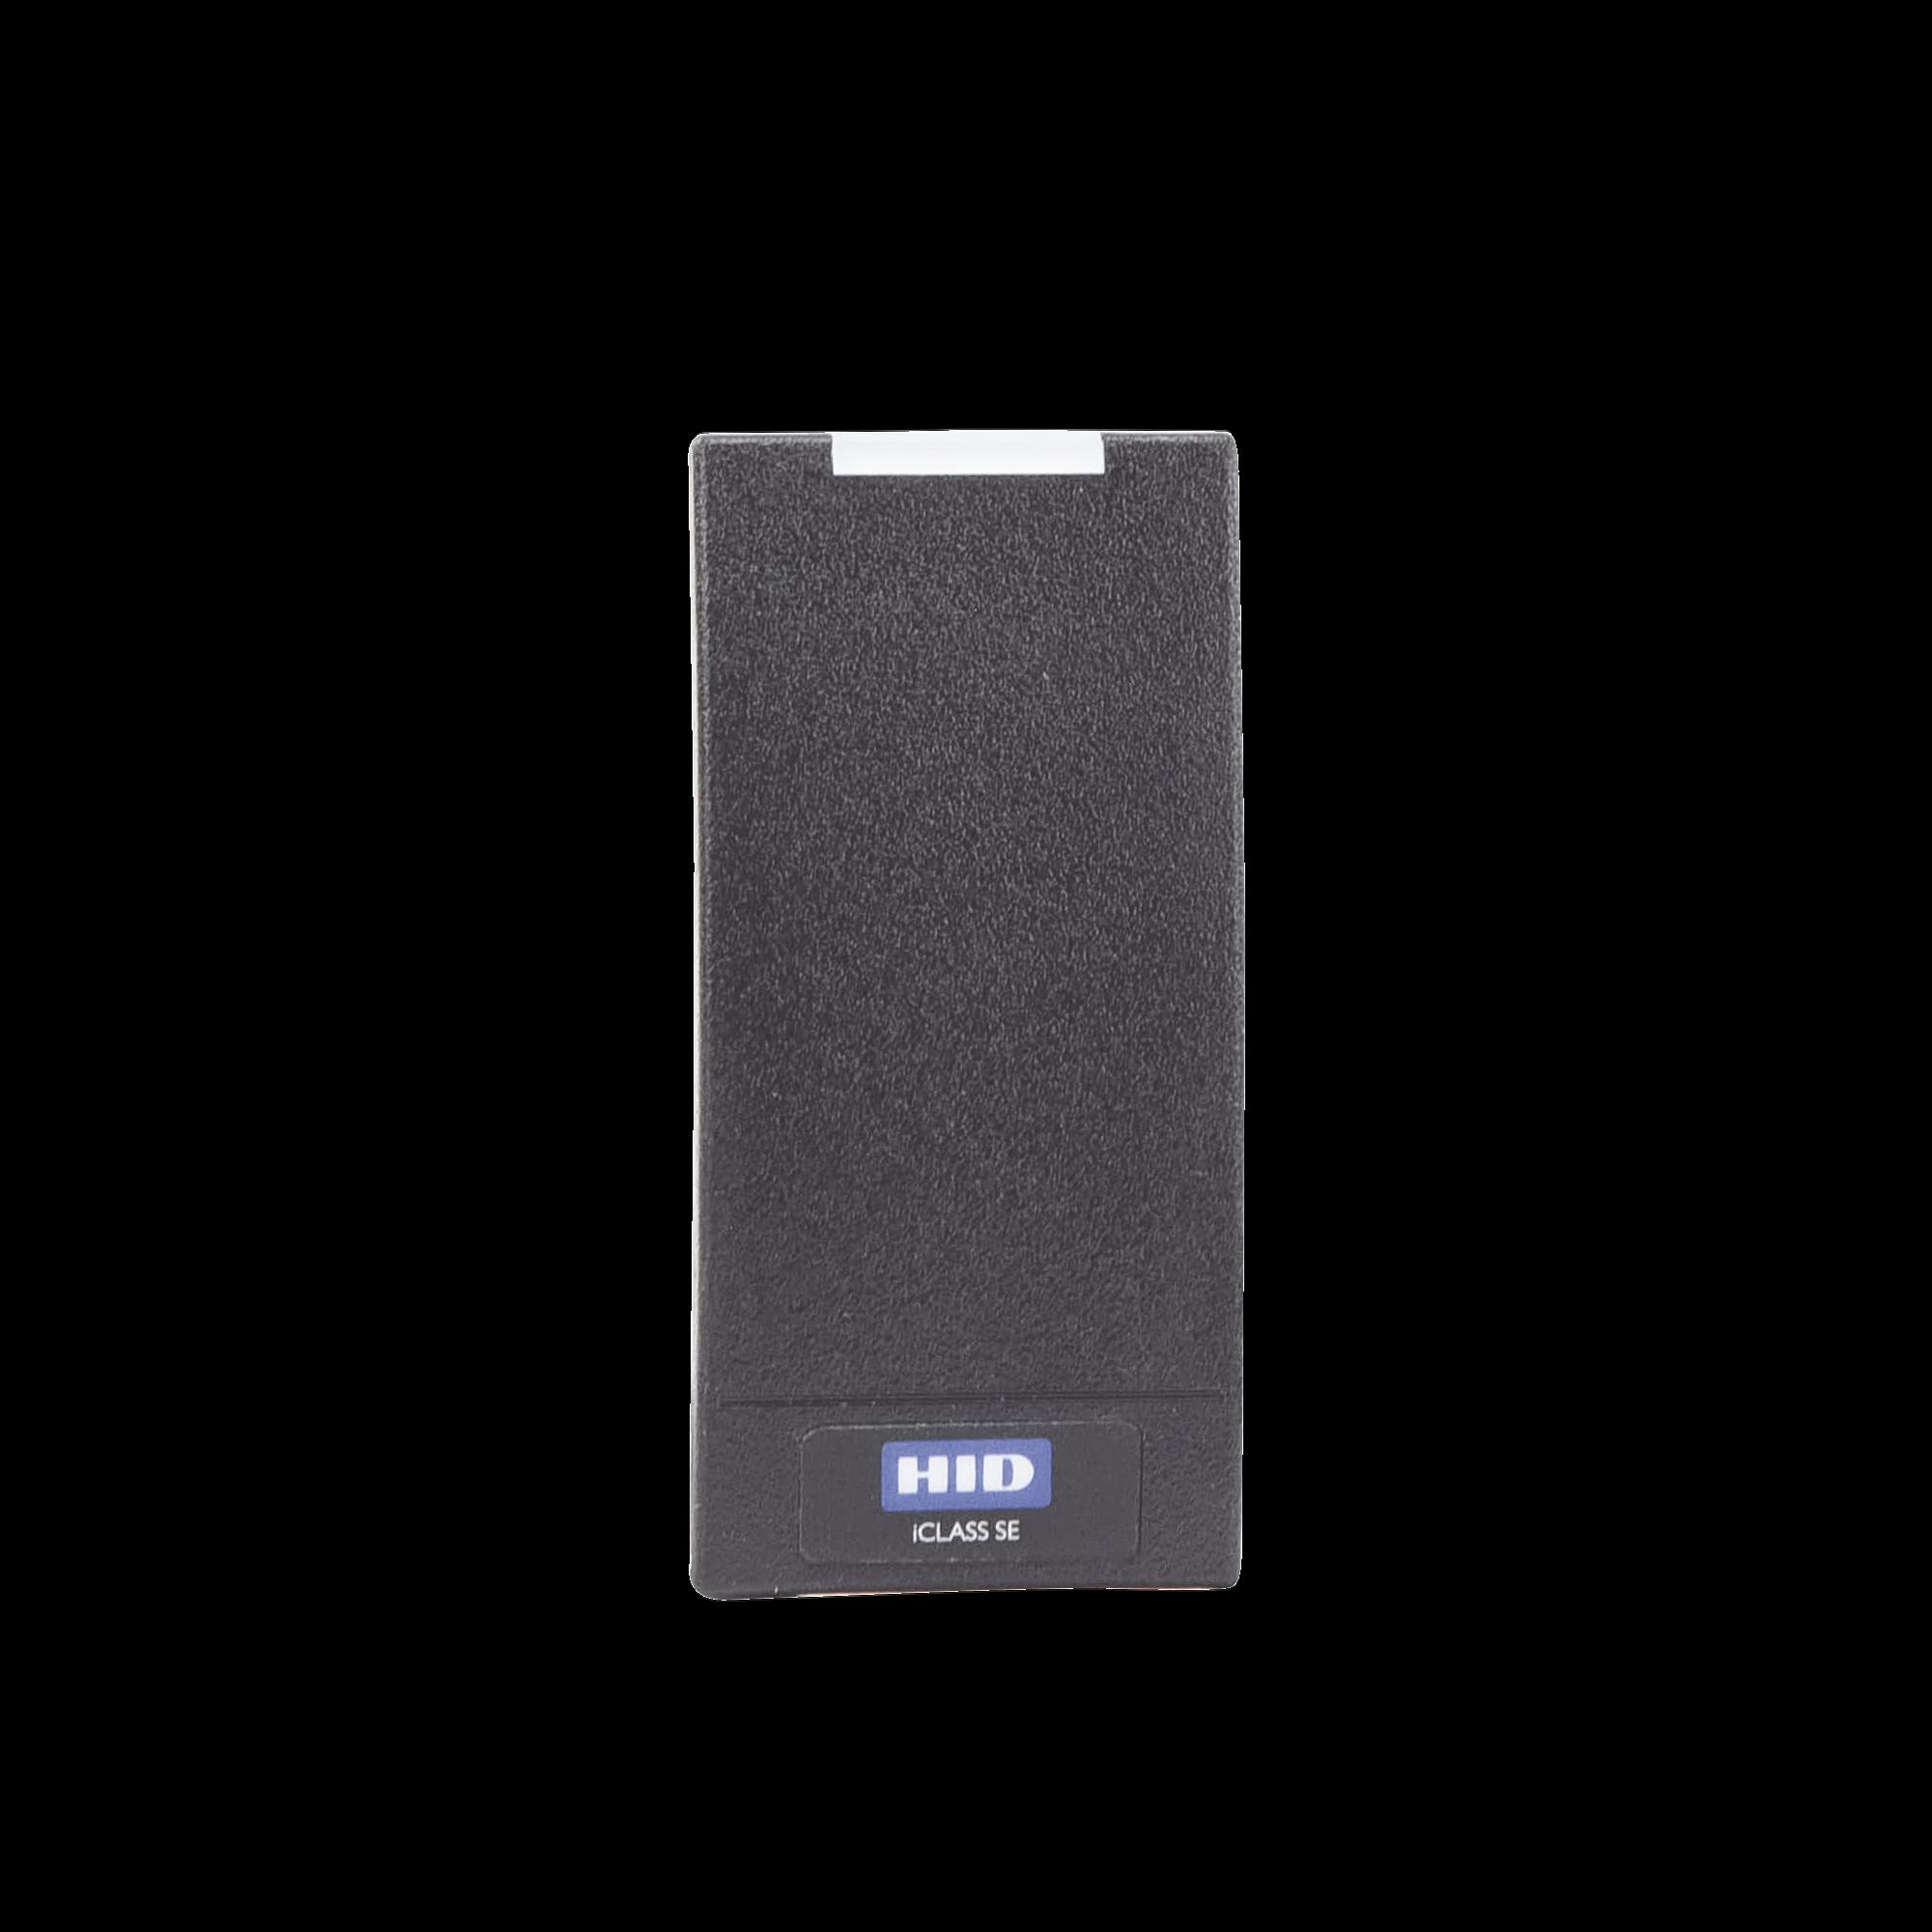 Lector R10 para Tecnologia iClass SEOS y MobileID NFC & Bluetooth/ Garantia de por Vida/ 900NBNNEK20000